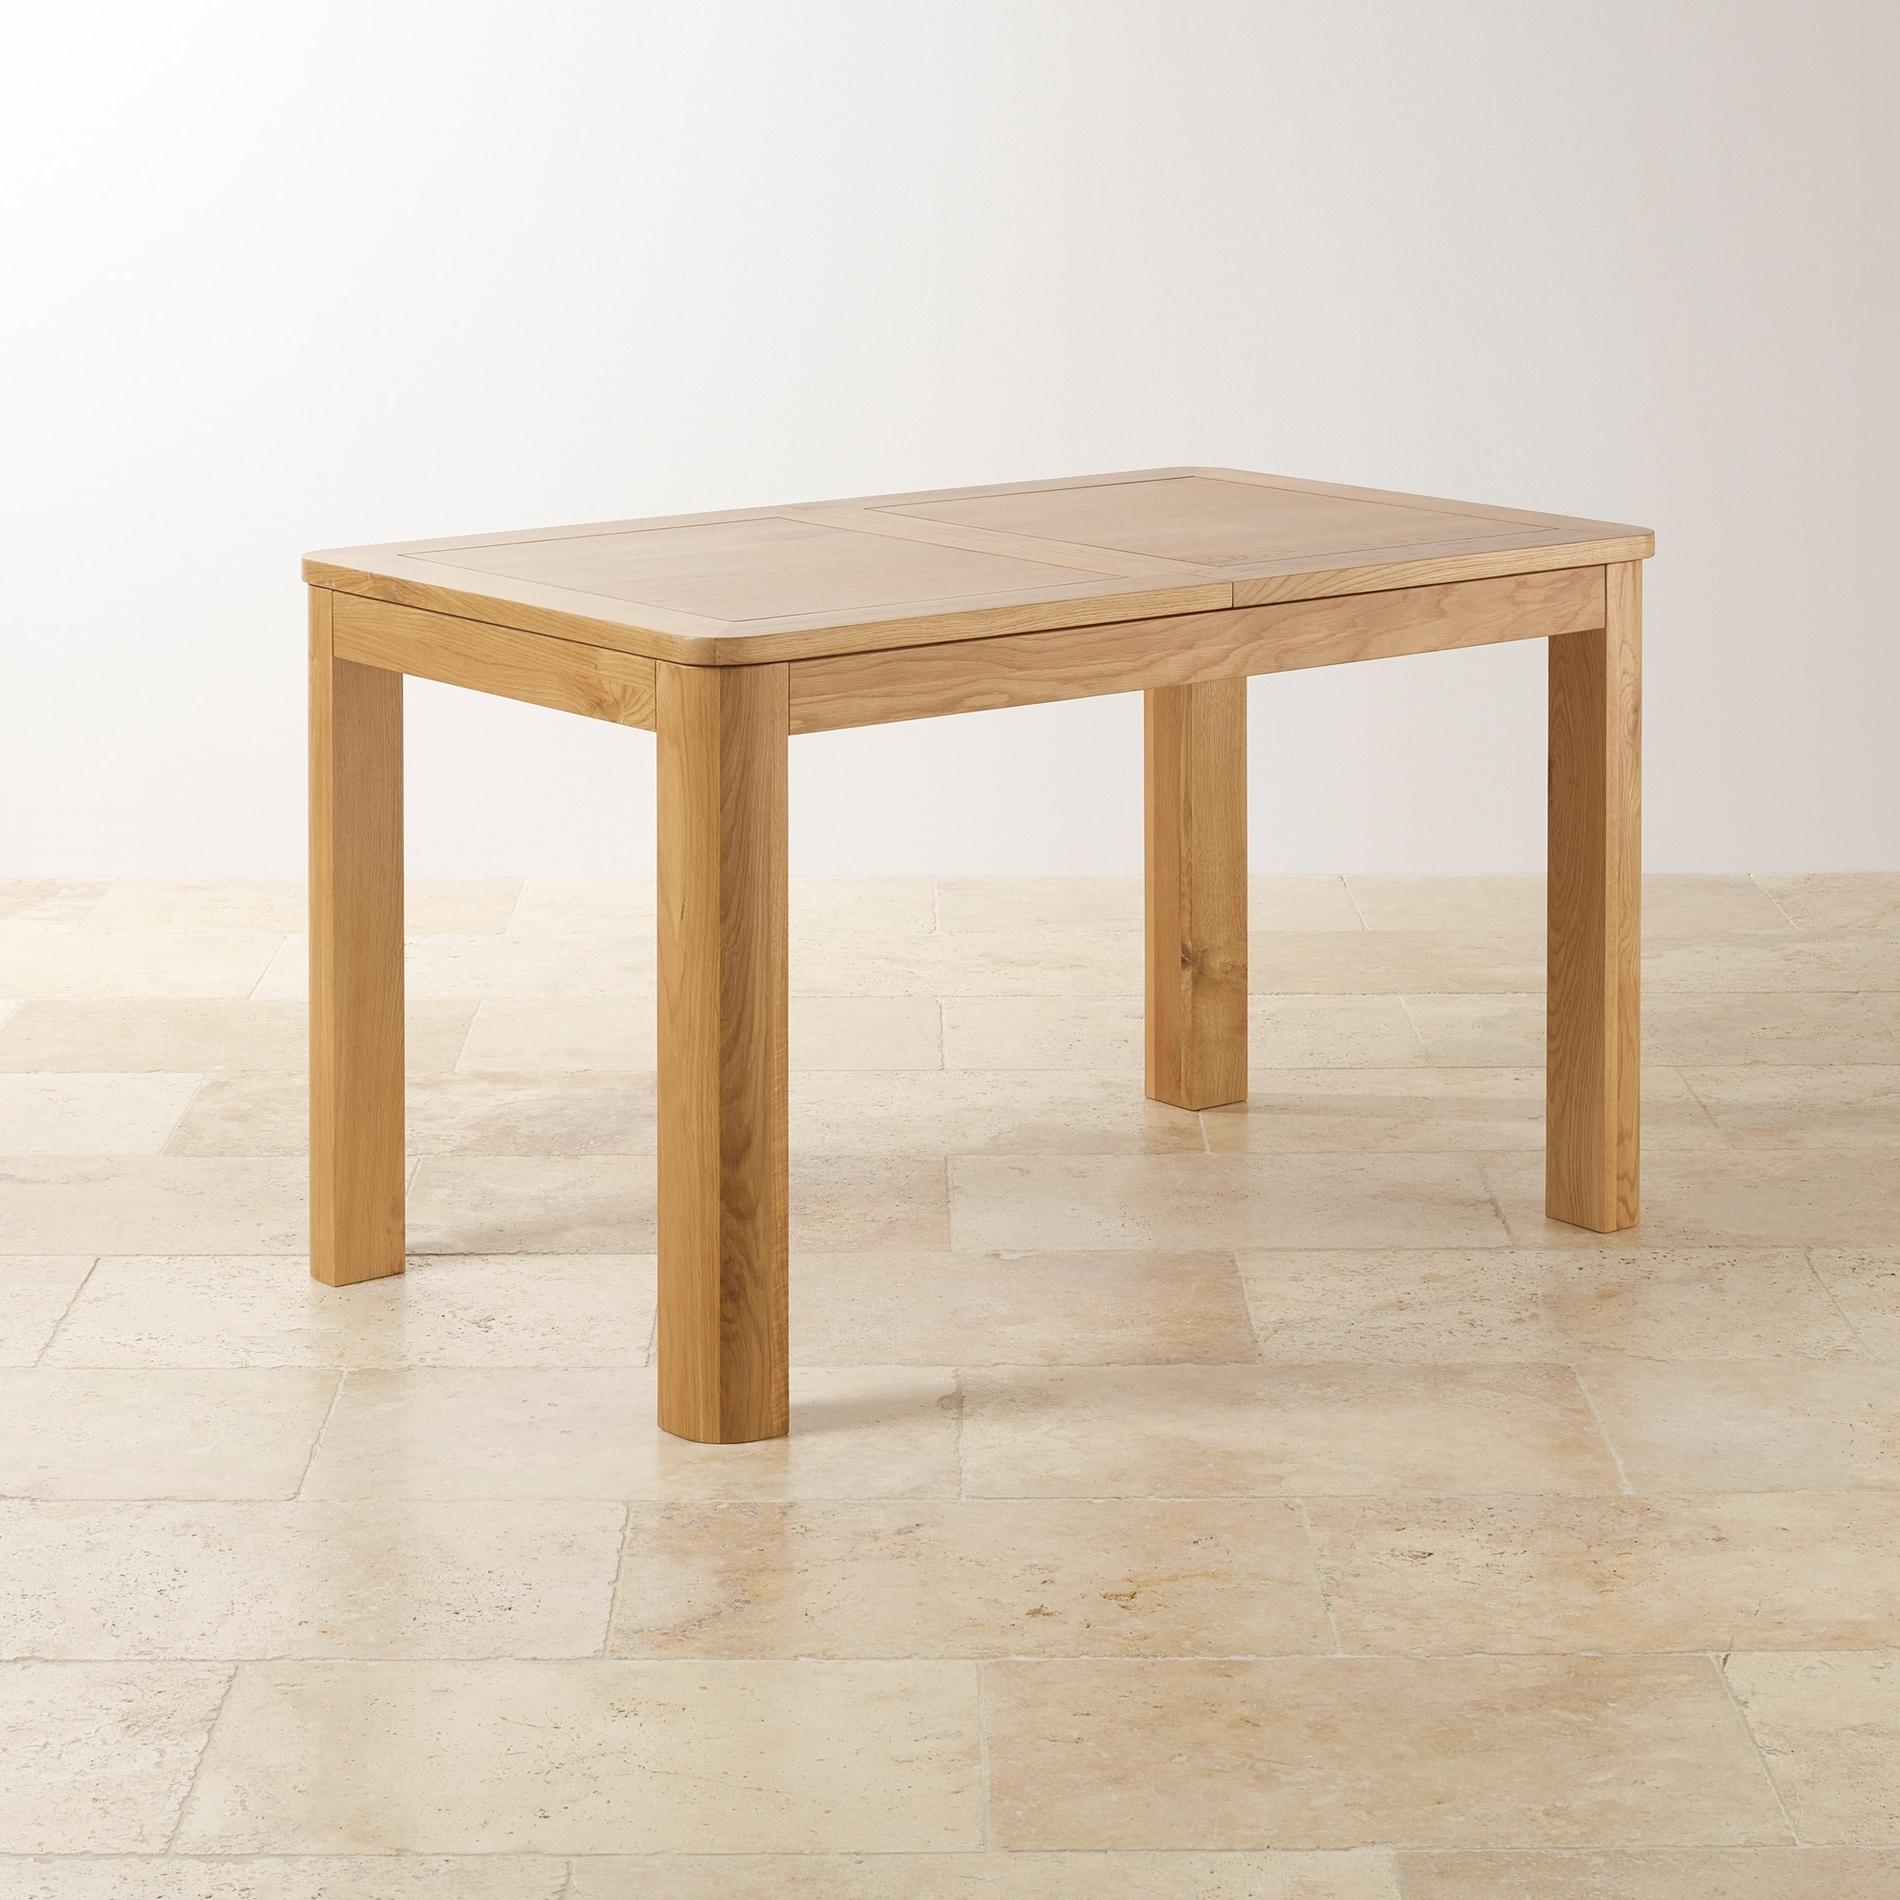 Oak Furniture Land (View 16 of 25)